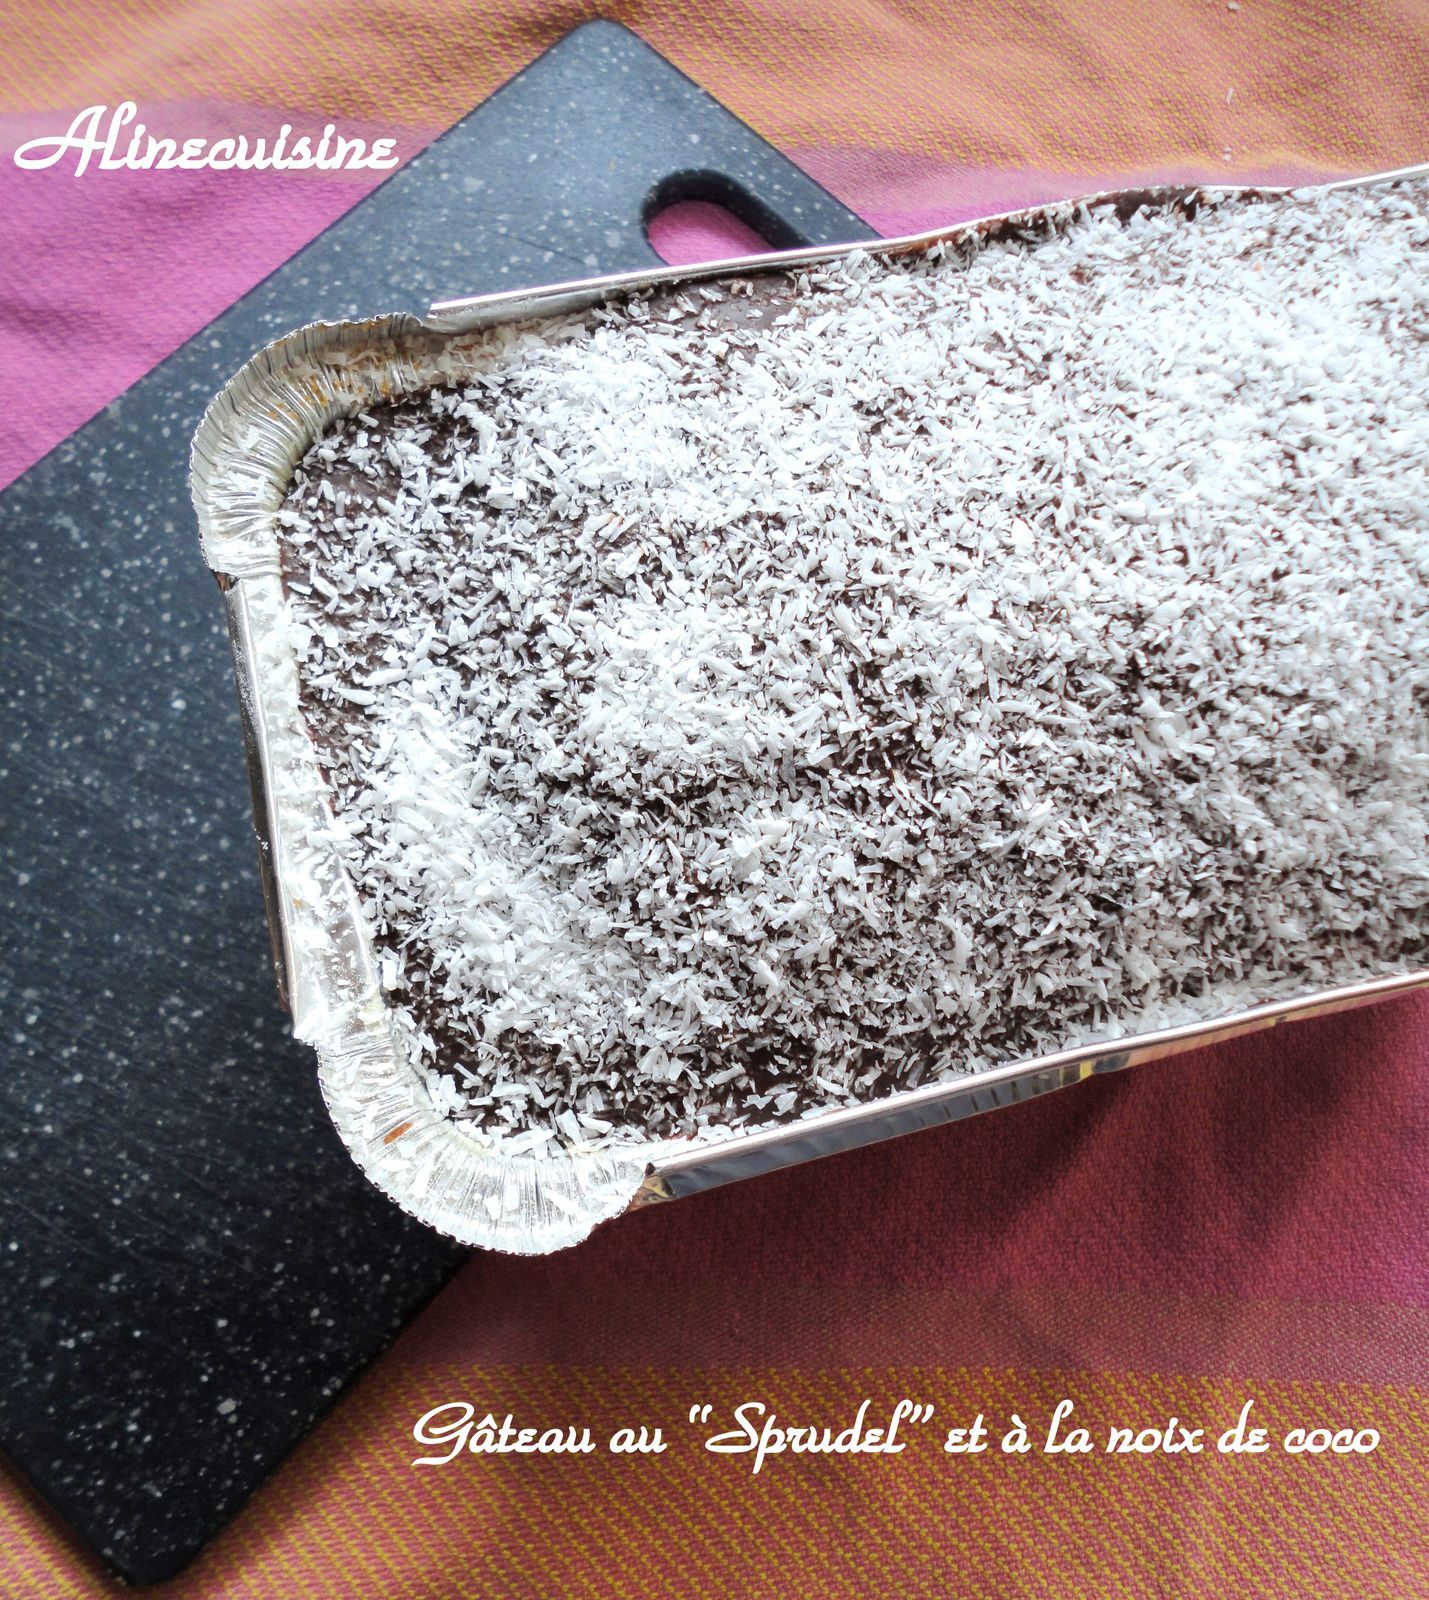 Gateau chocolat noix de coco tupperware